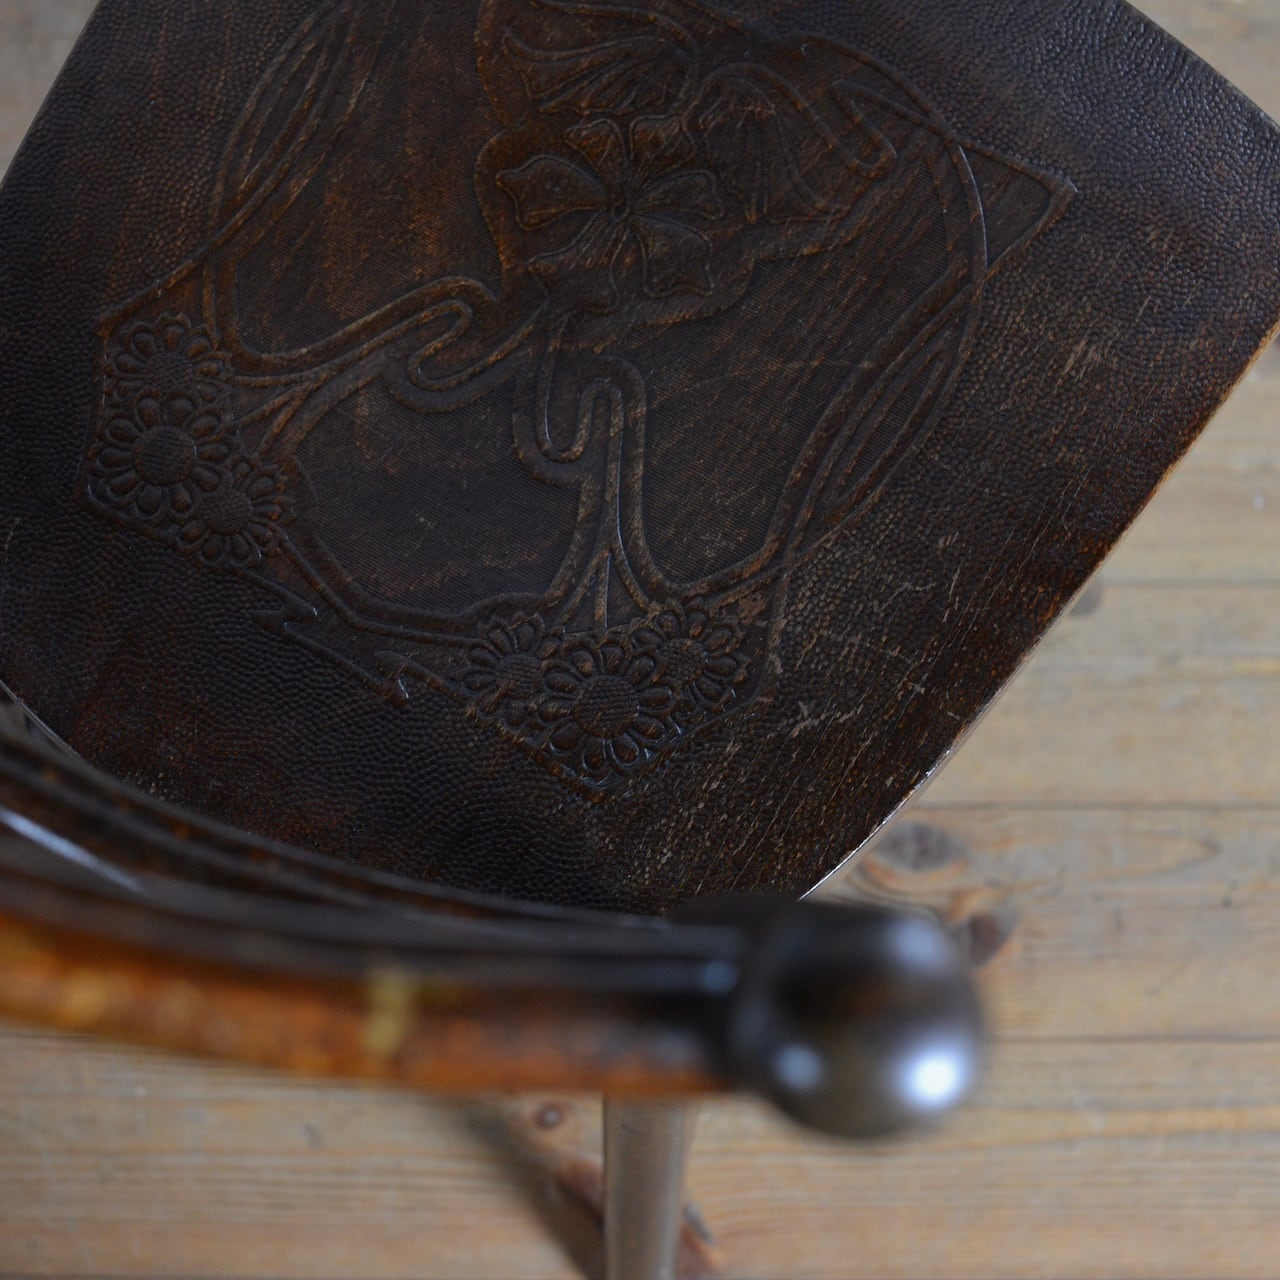 Bentwood Chair / ベントウッドチェア〈ダイニングチェア・椅子・トーネット〉112021